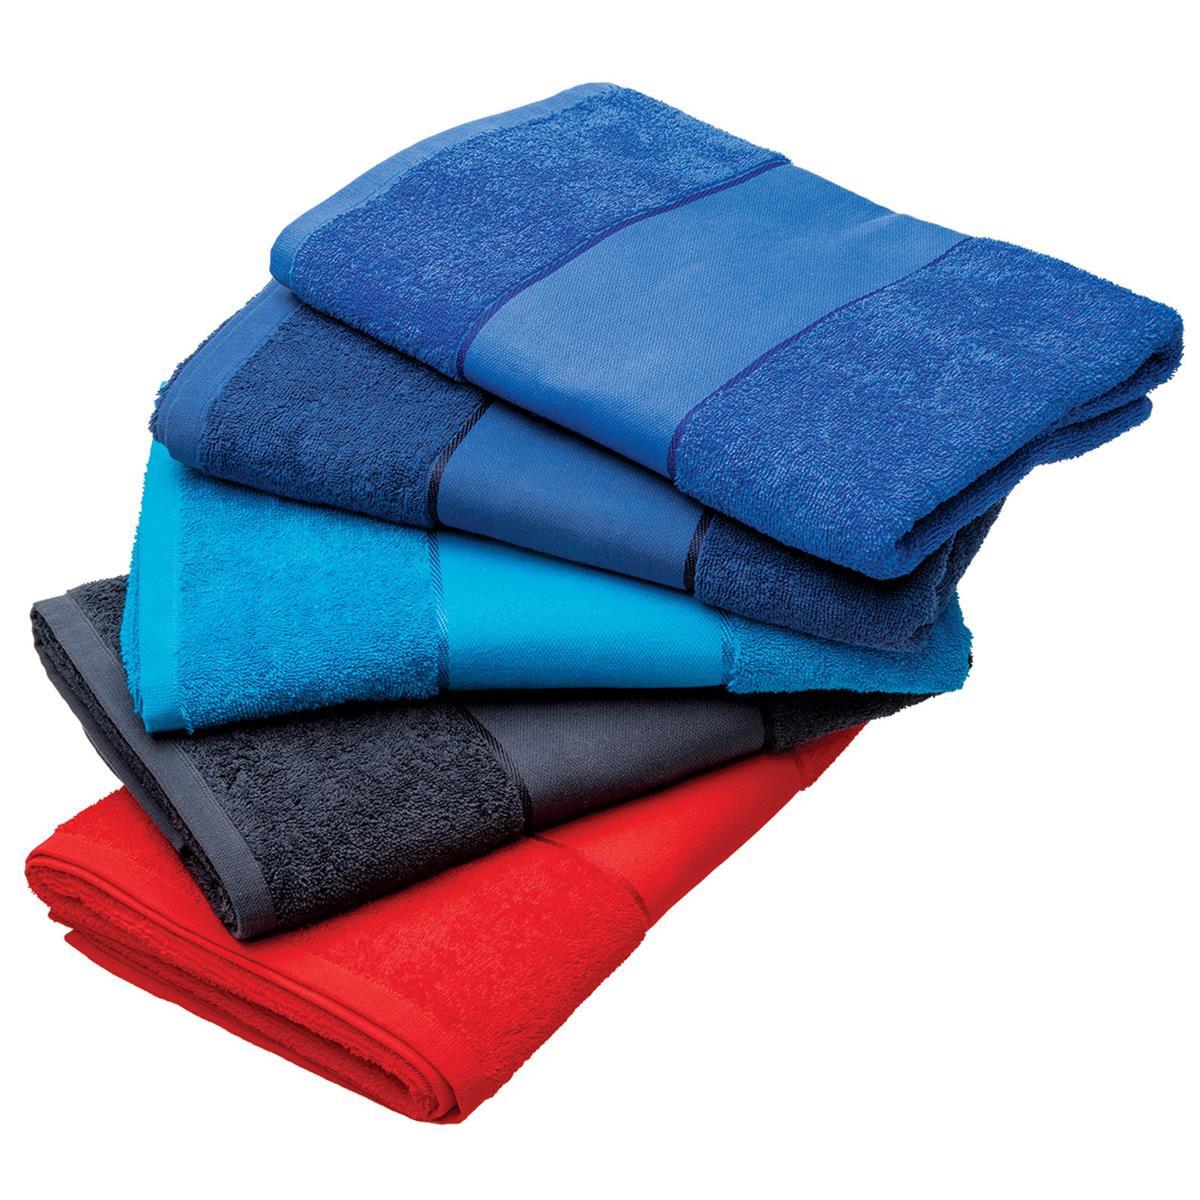 Promotional Product Bondi Beach Towel